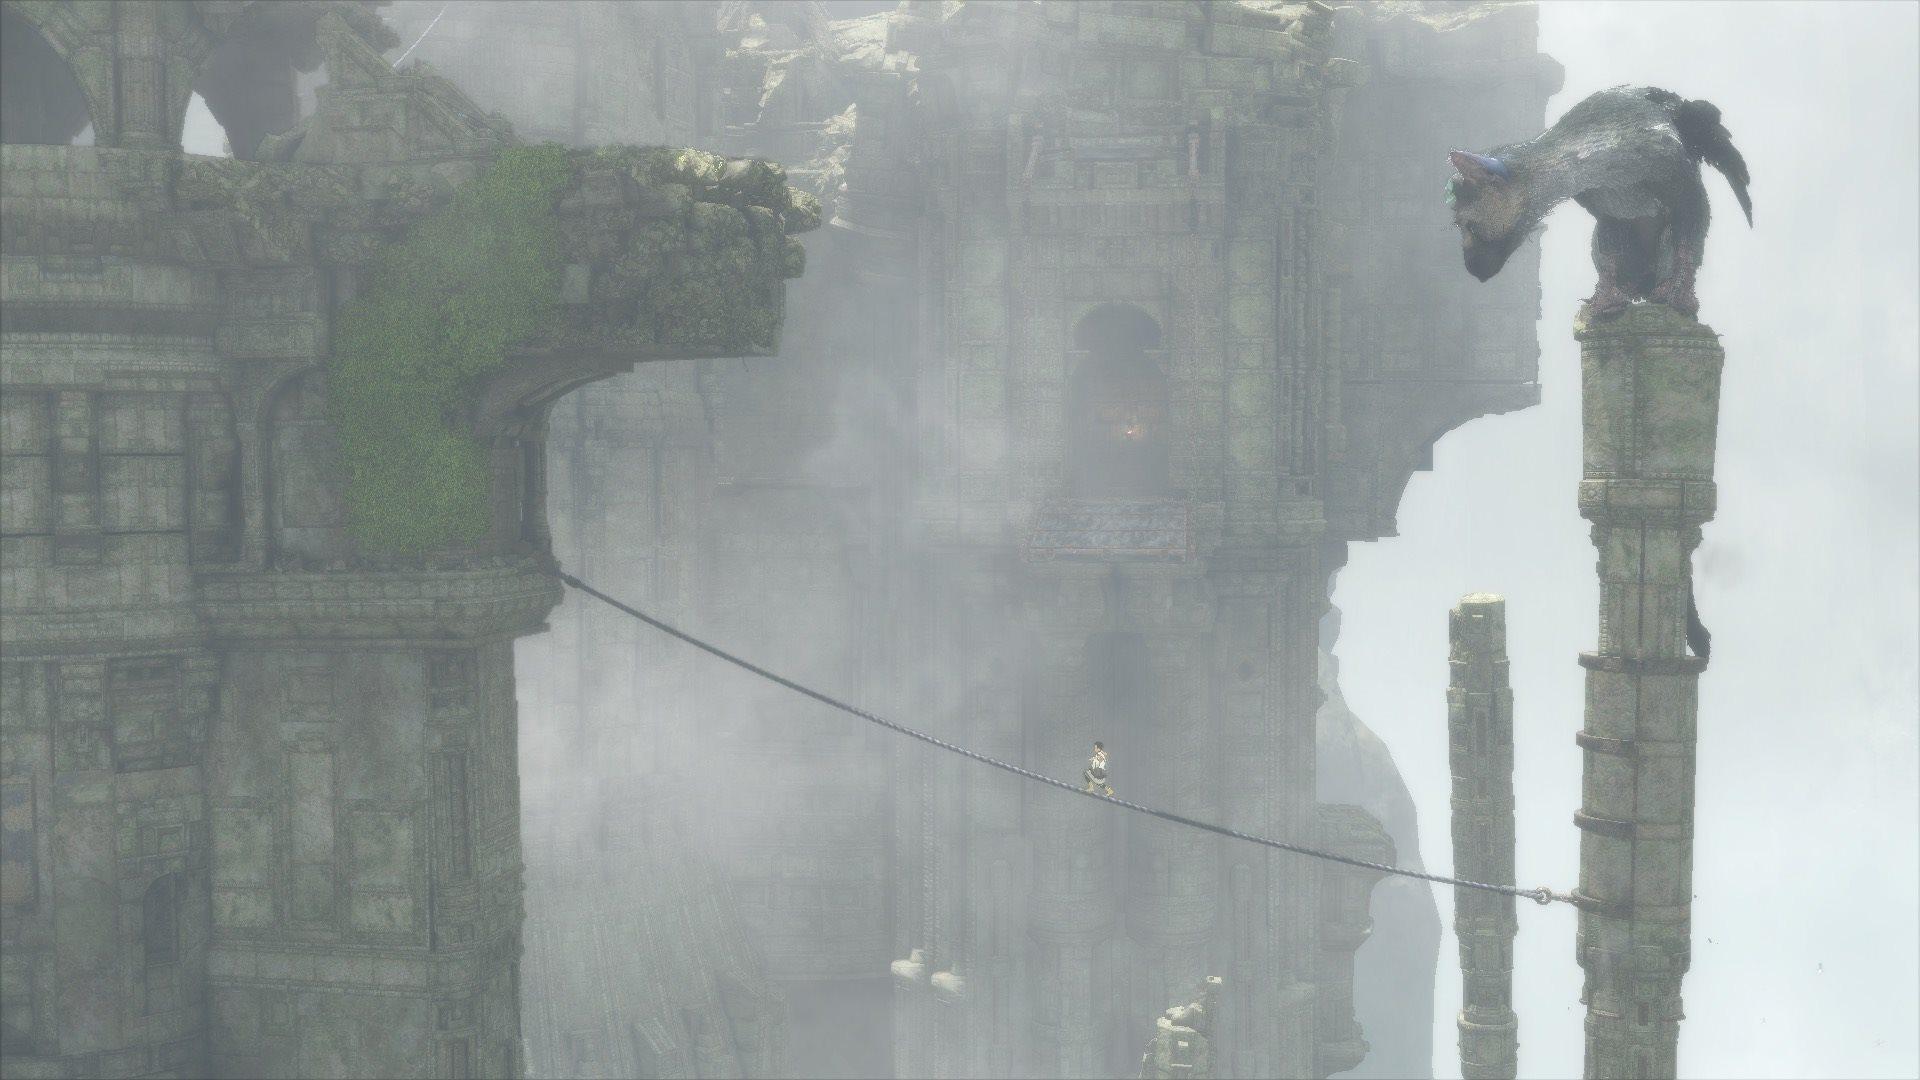 Vídeo de introdução para The Last Guardian